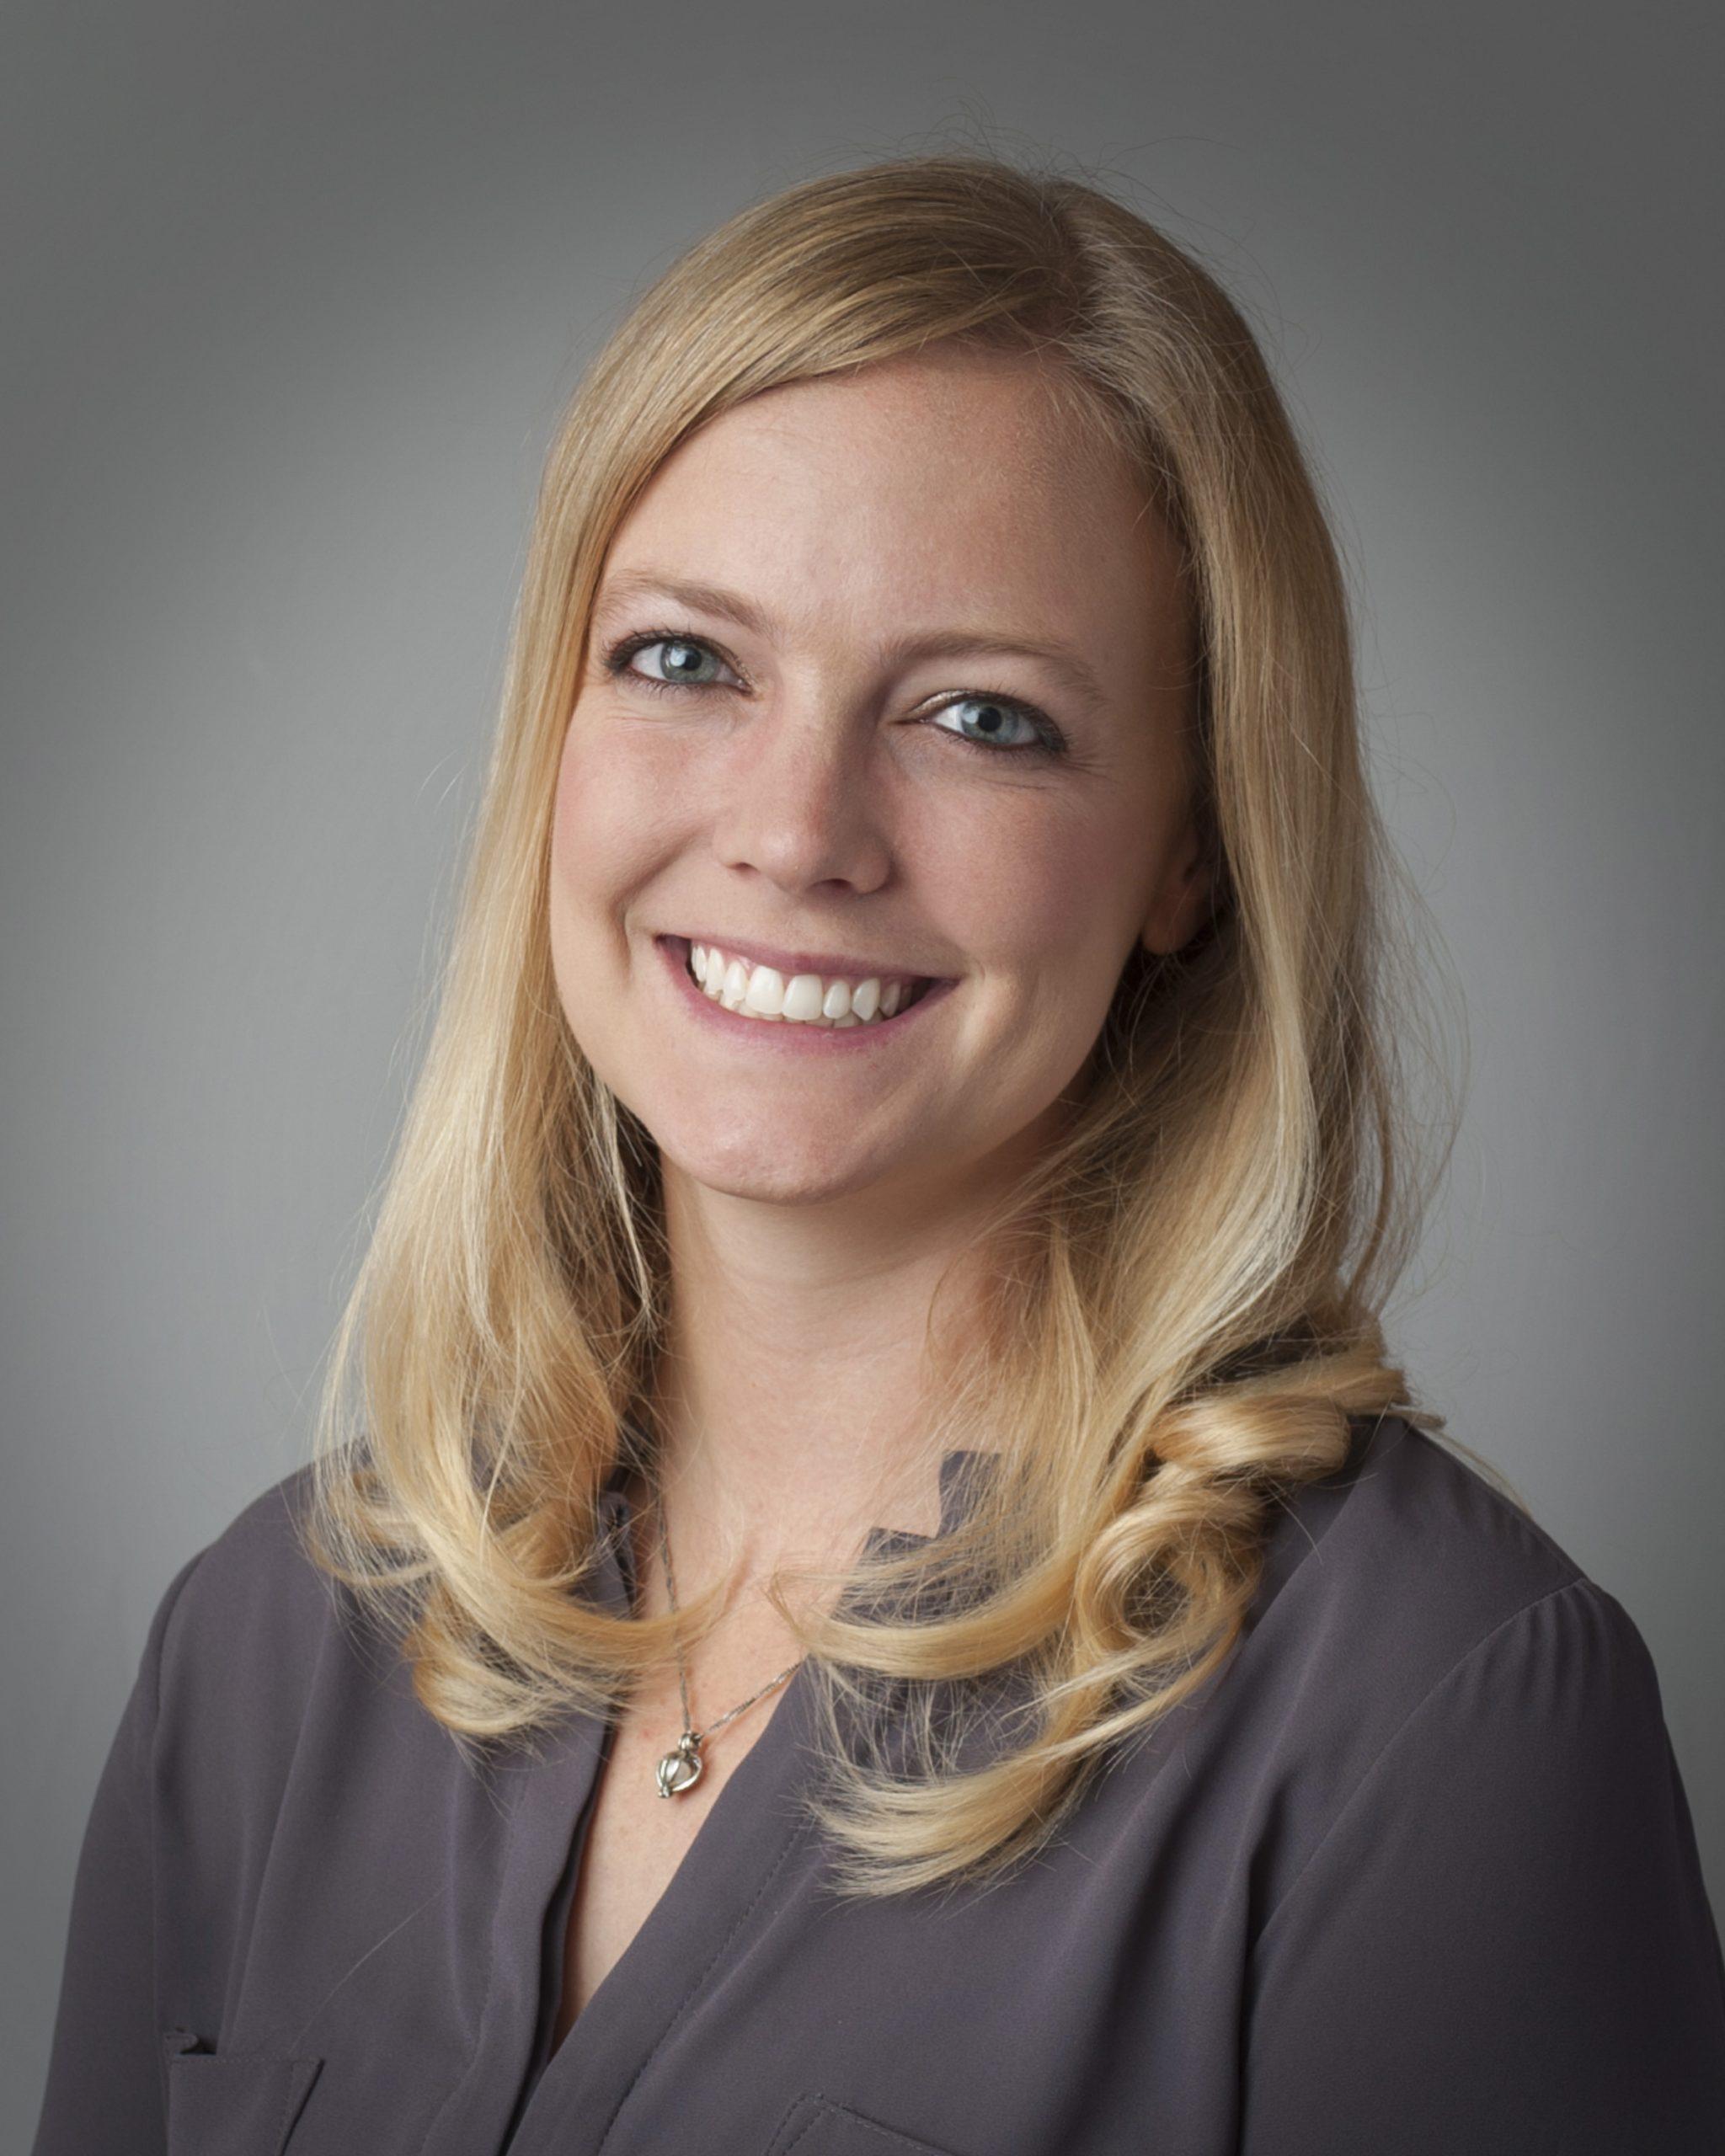 Elise Bjork, PT, DPT, SCS